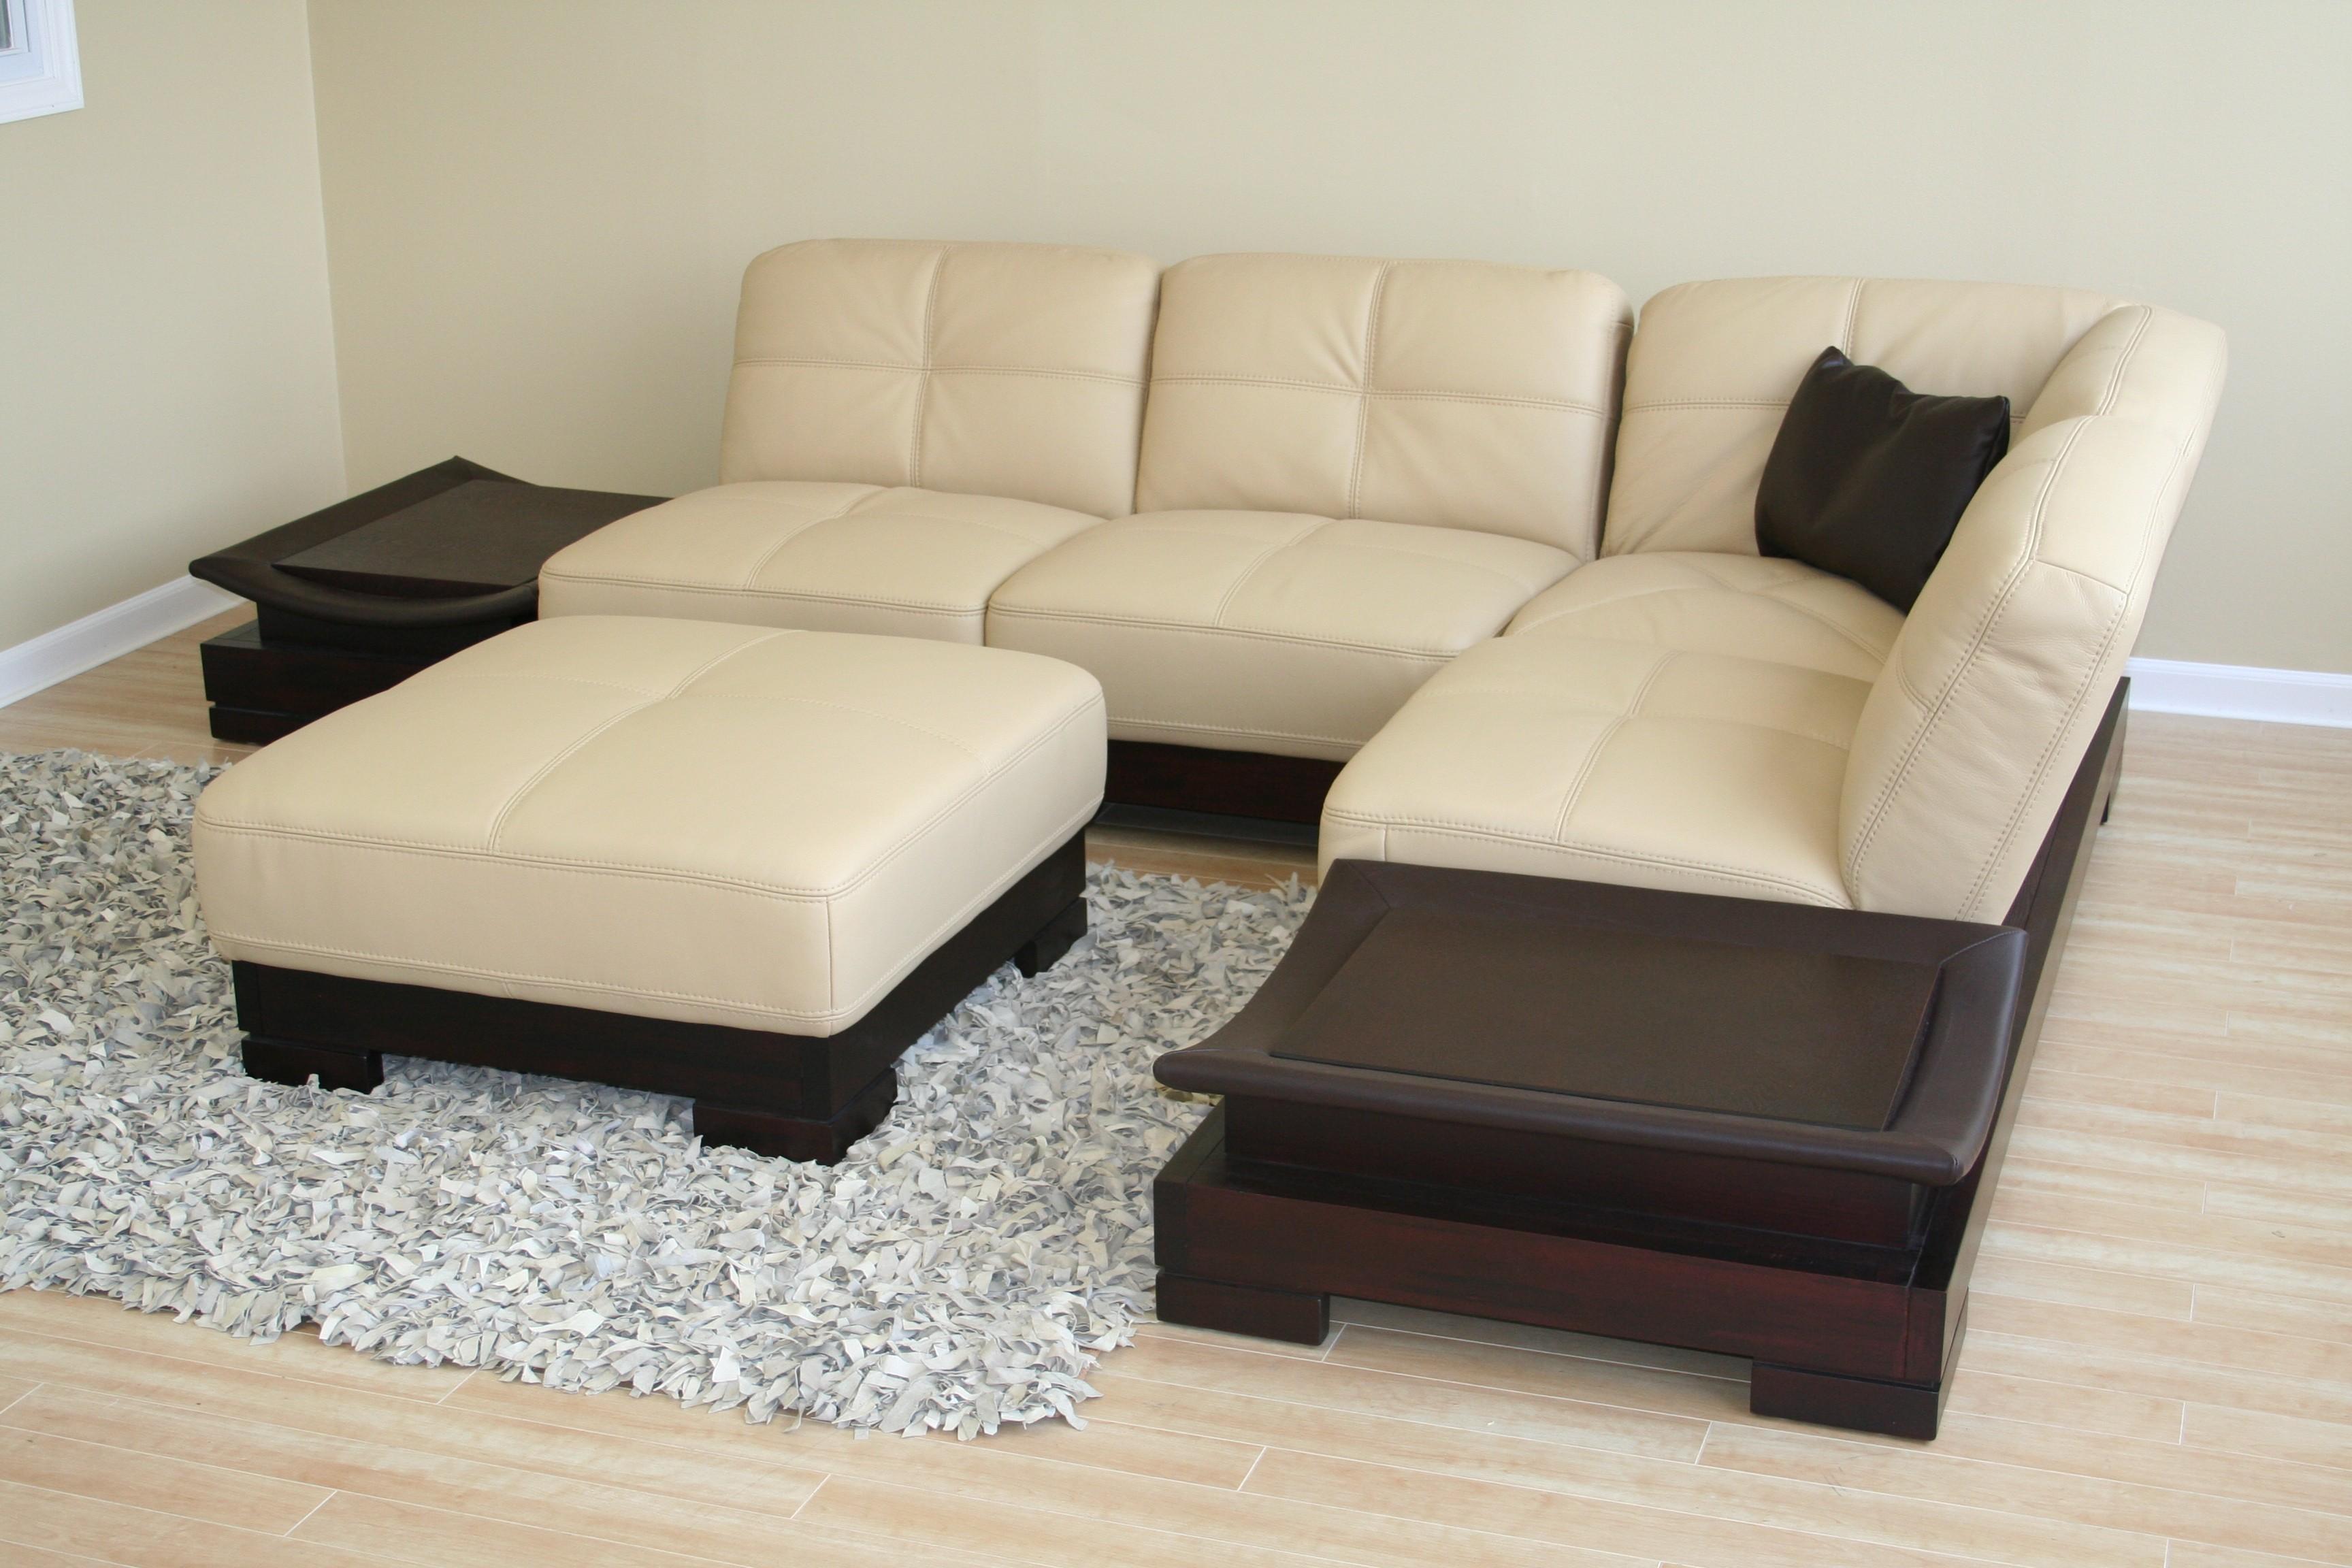 Small Scale Leather Sofa €  Hereo Sofa | Tehranmix Decoration Regarding Small Scale Leather Sectional Sofas (Image 12 of 20)